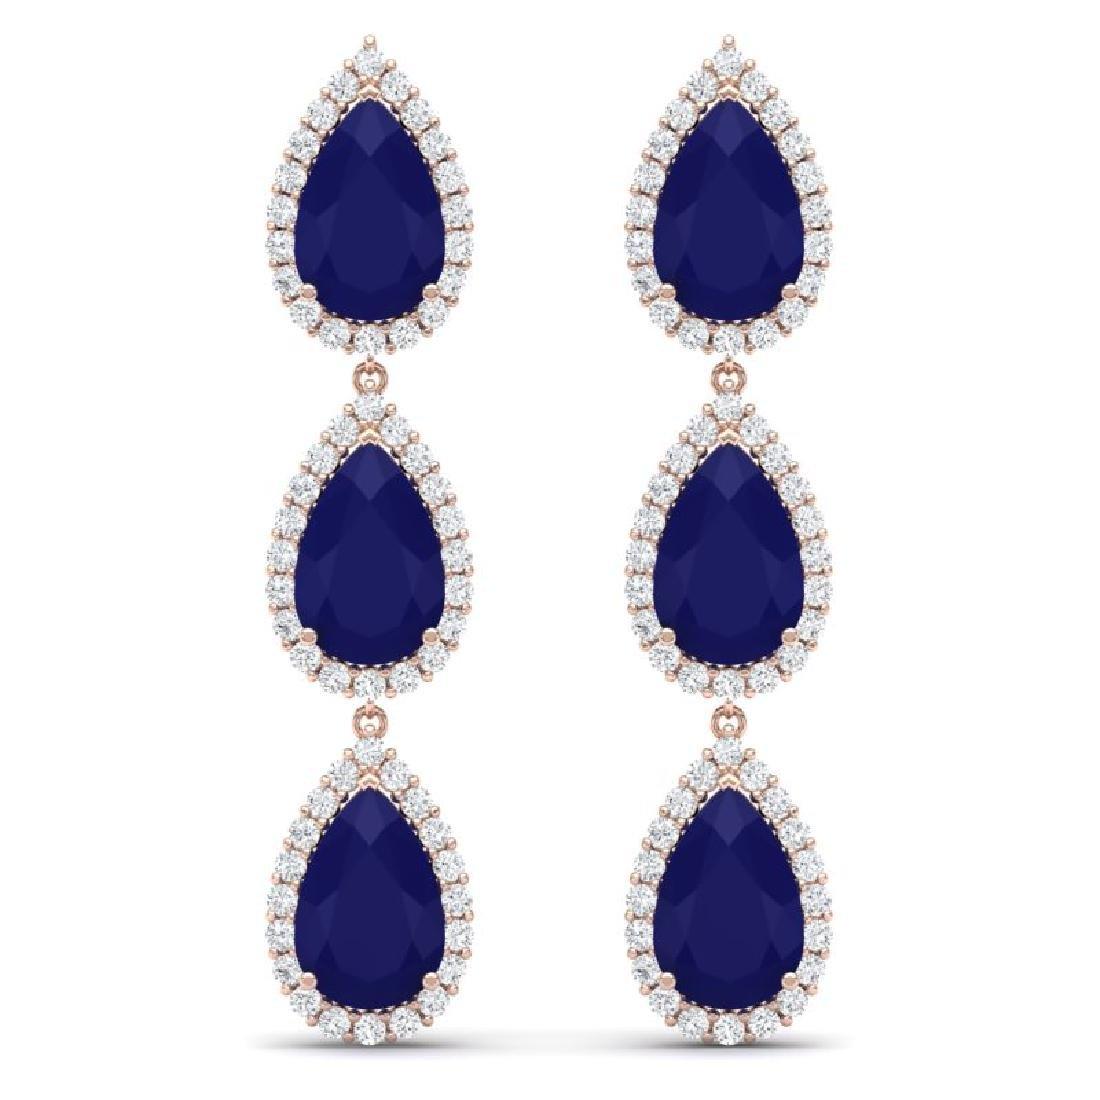 27.06 CTW Royalty Sapphire & VS Diamond Earrings 18K